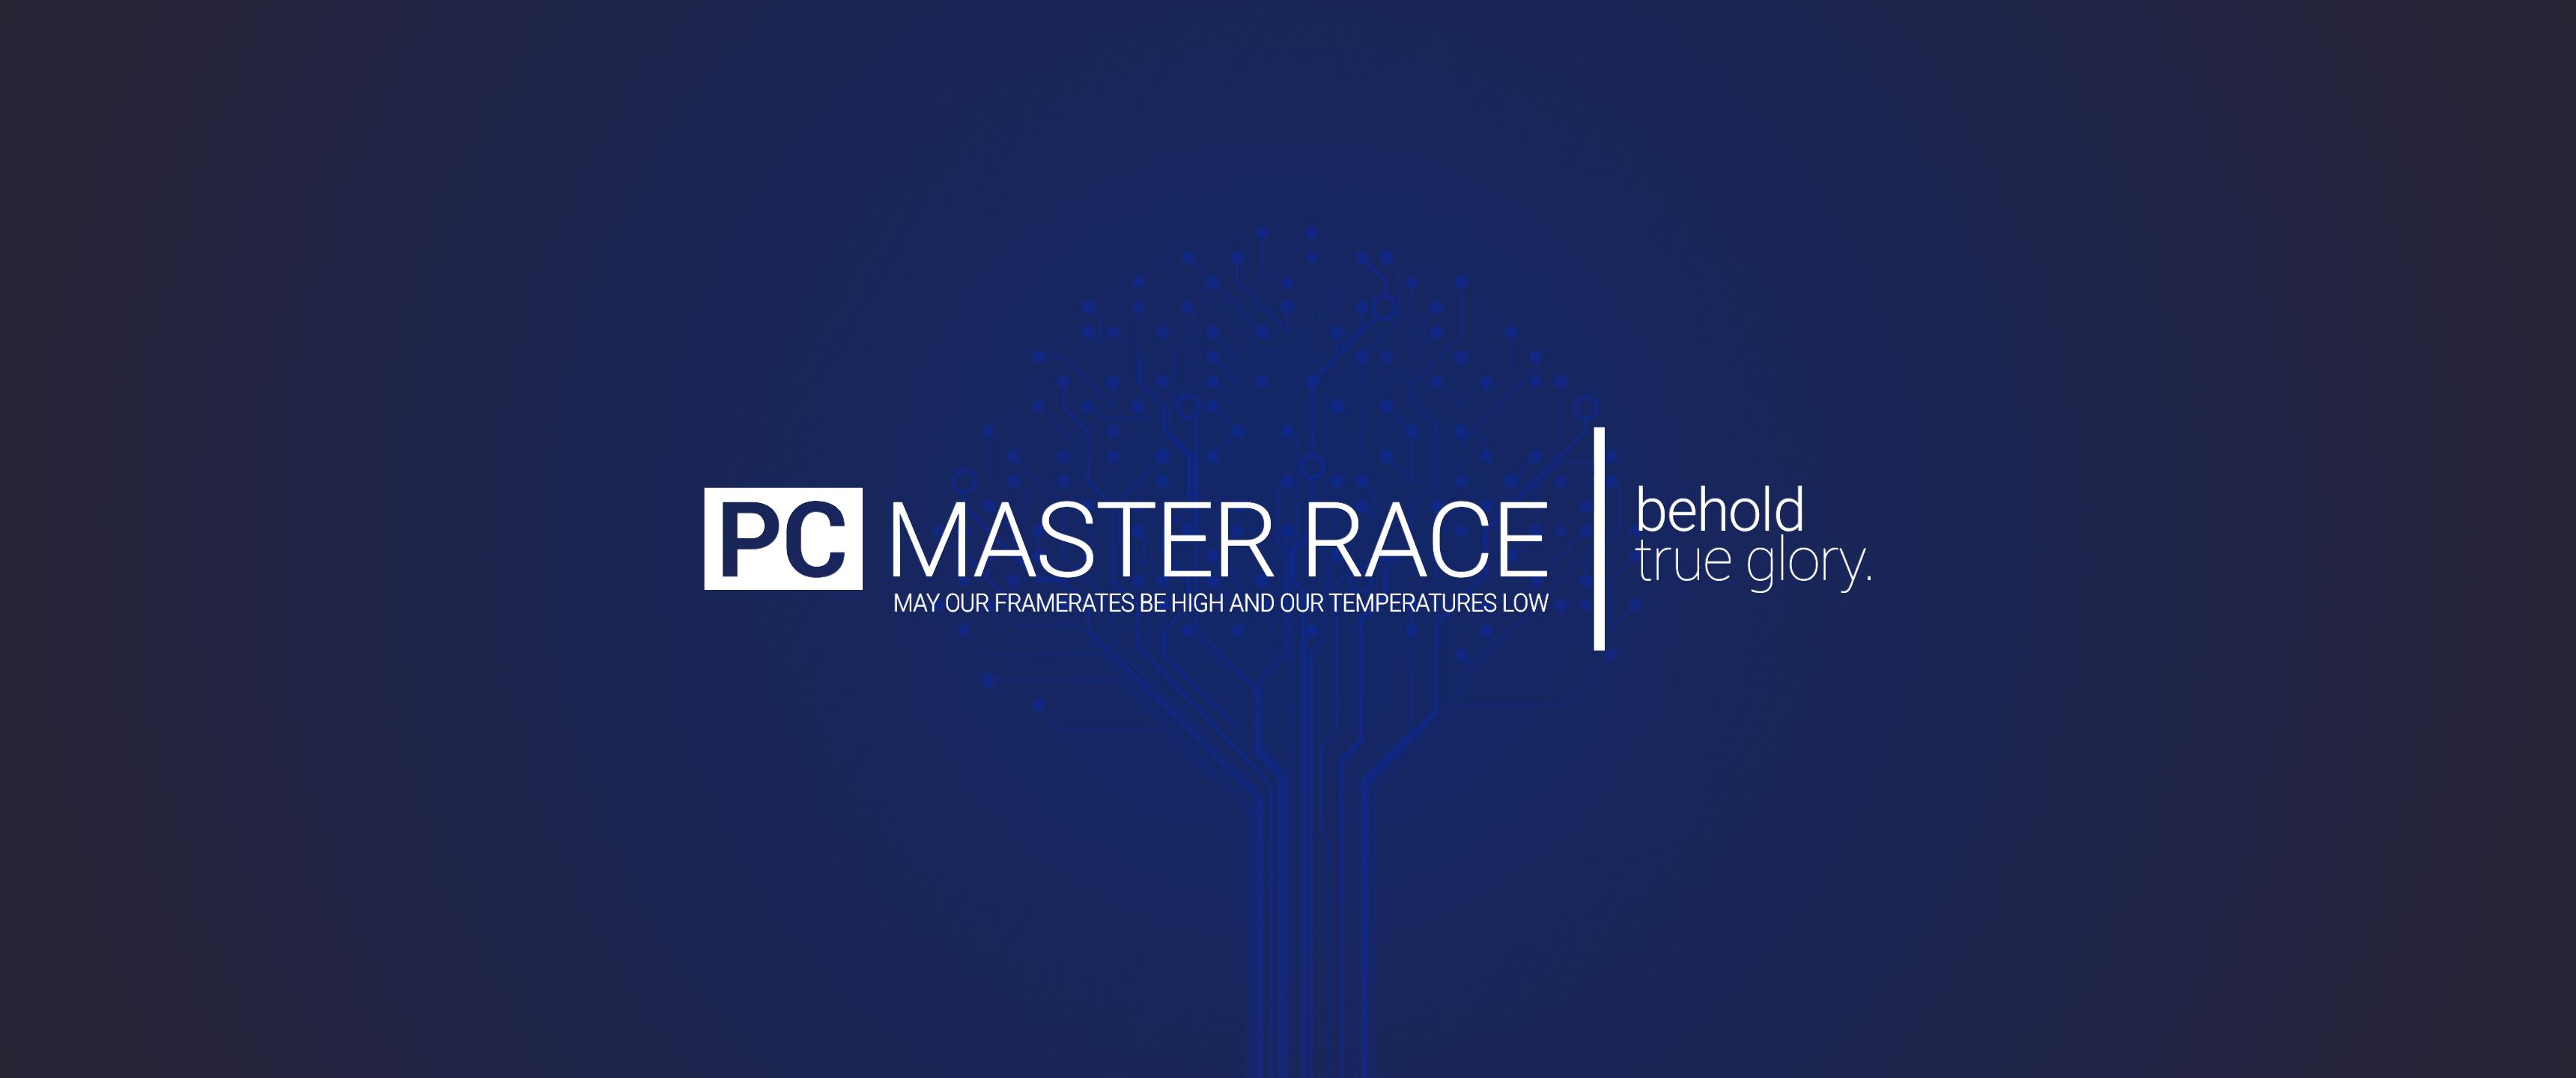 Pc Master Race Wallpaper 1080p